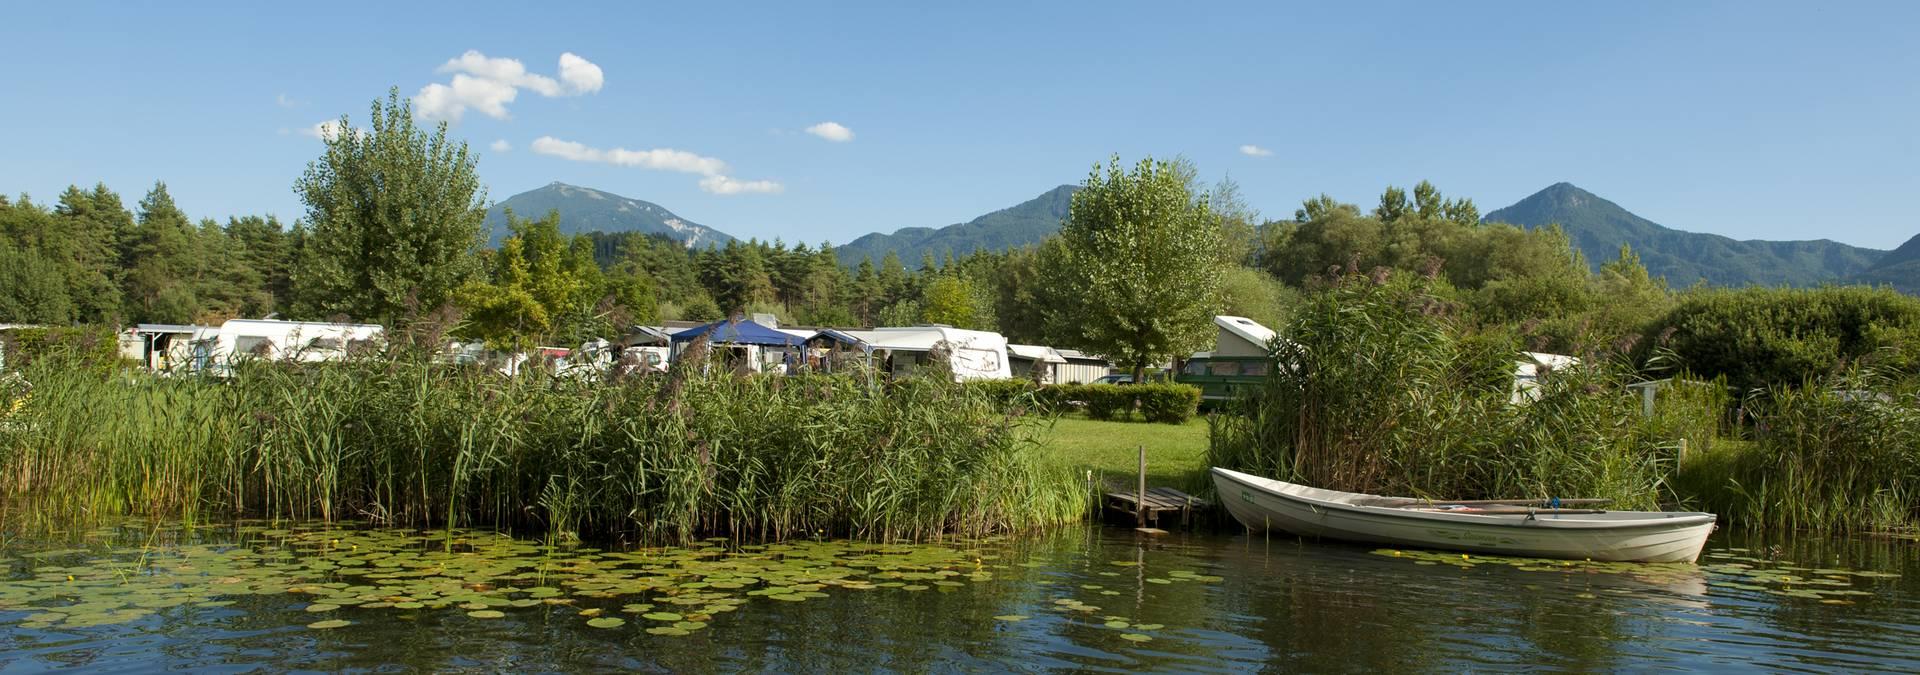 Camping am Gösselsdorfersee